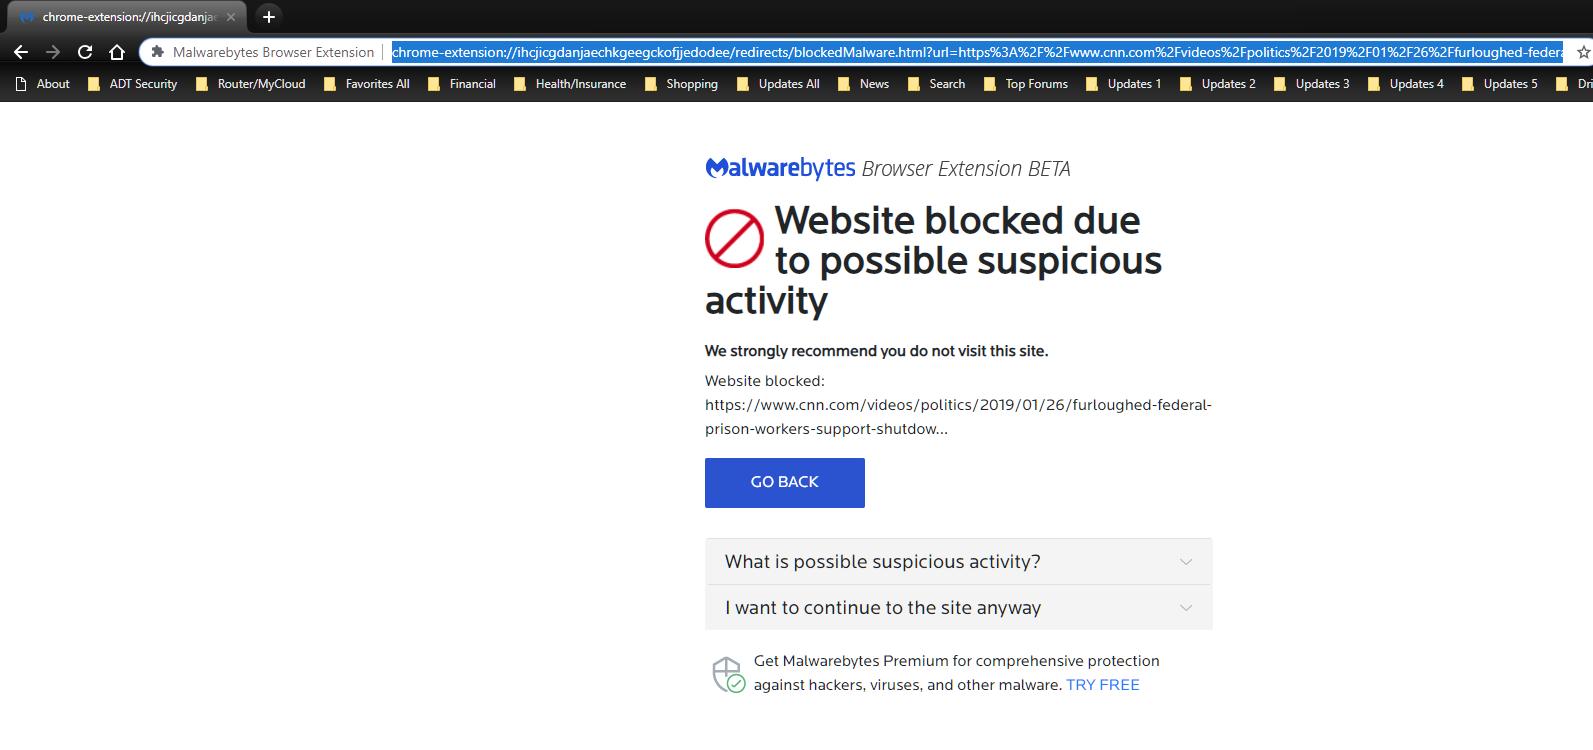 Browser Extension V1 0 36 Blocking CNN Videos - Malwarebytes for